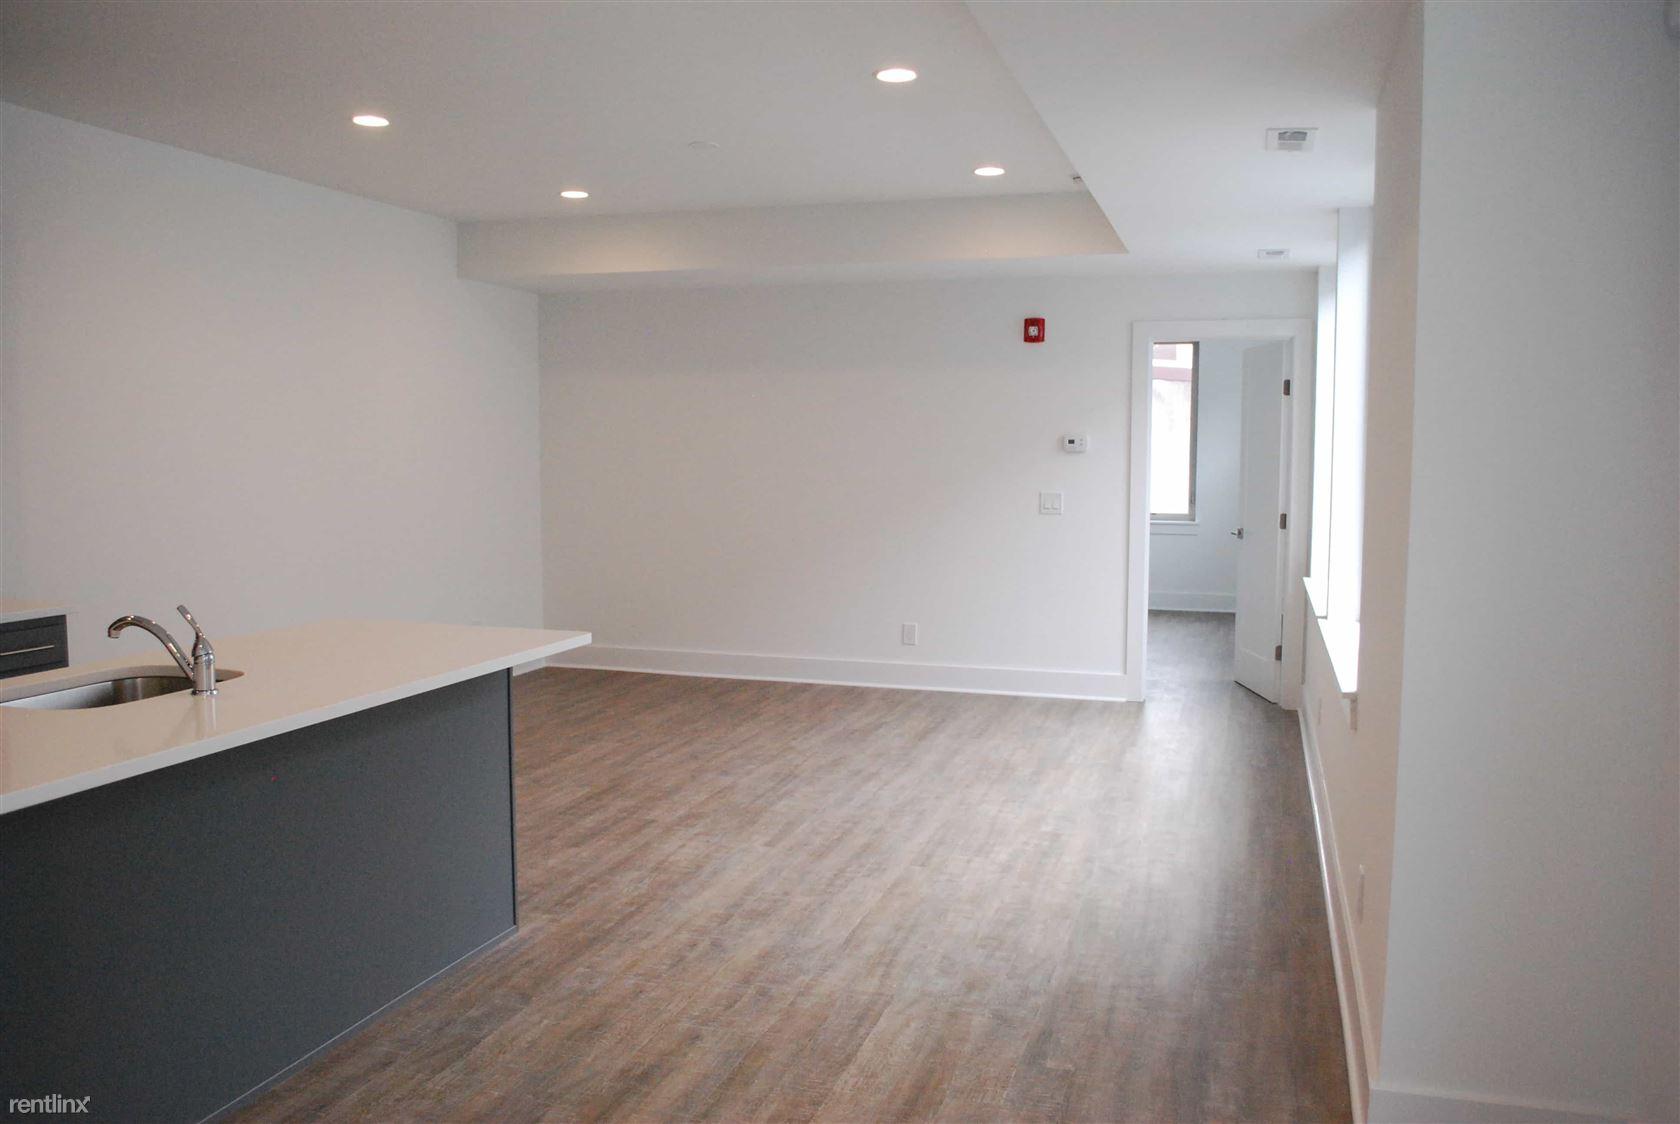 1206 N 7TH ST Unit 3B, Philadelphia, PA - $2,250 USD/ month